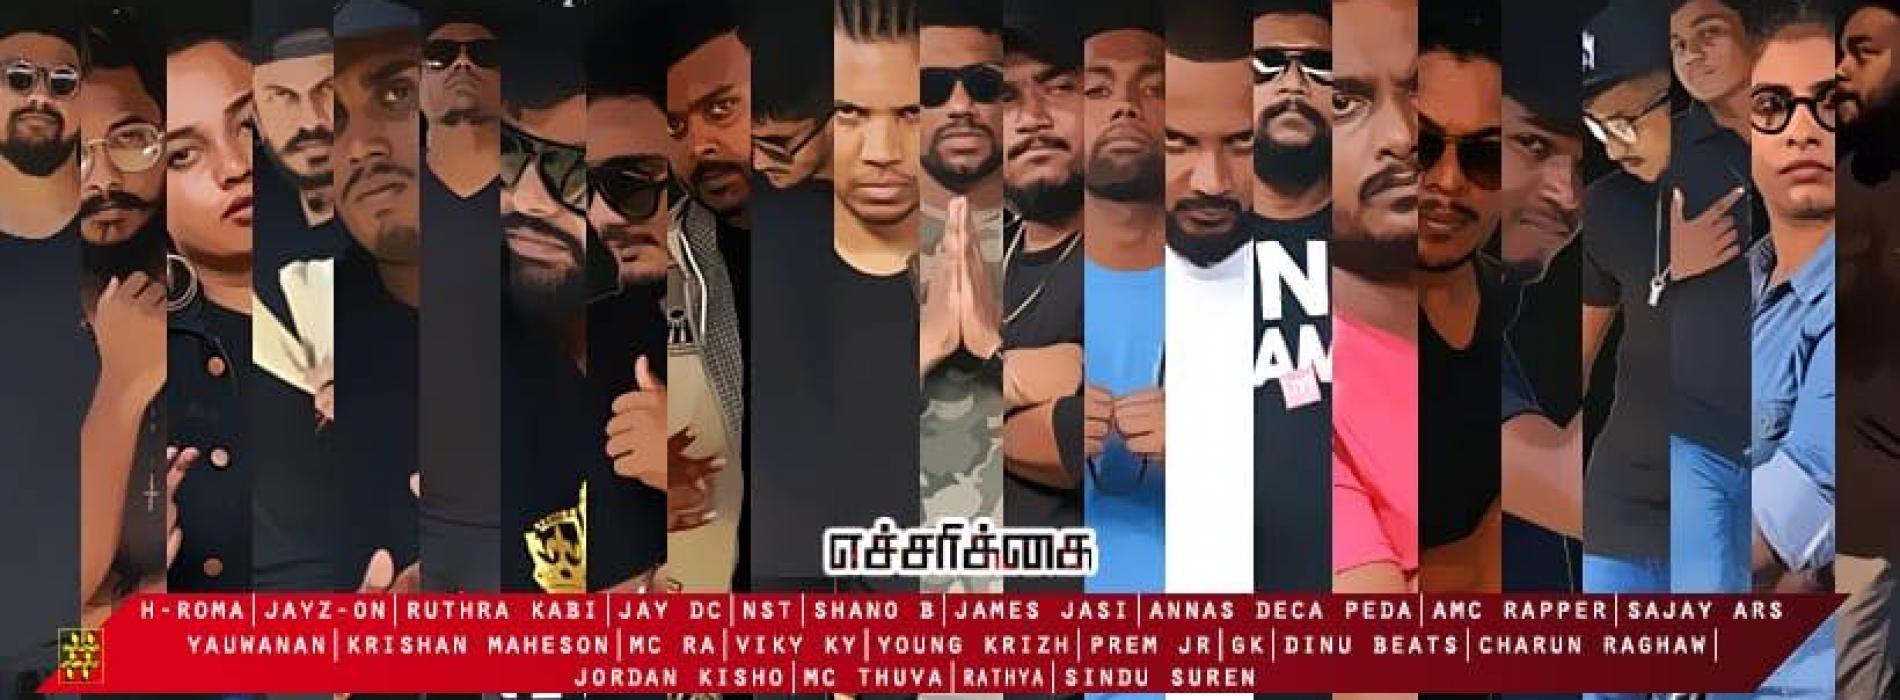 Echcharikkai Official Music Video – The World's Biggest Tamil Rap Cypher